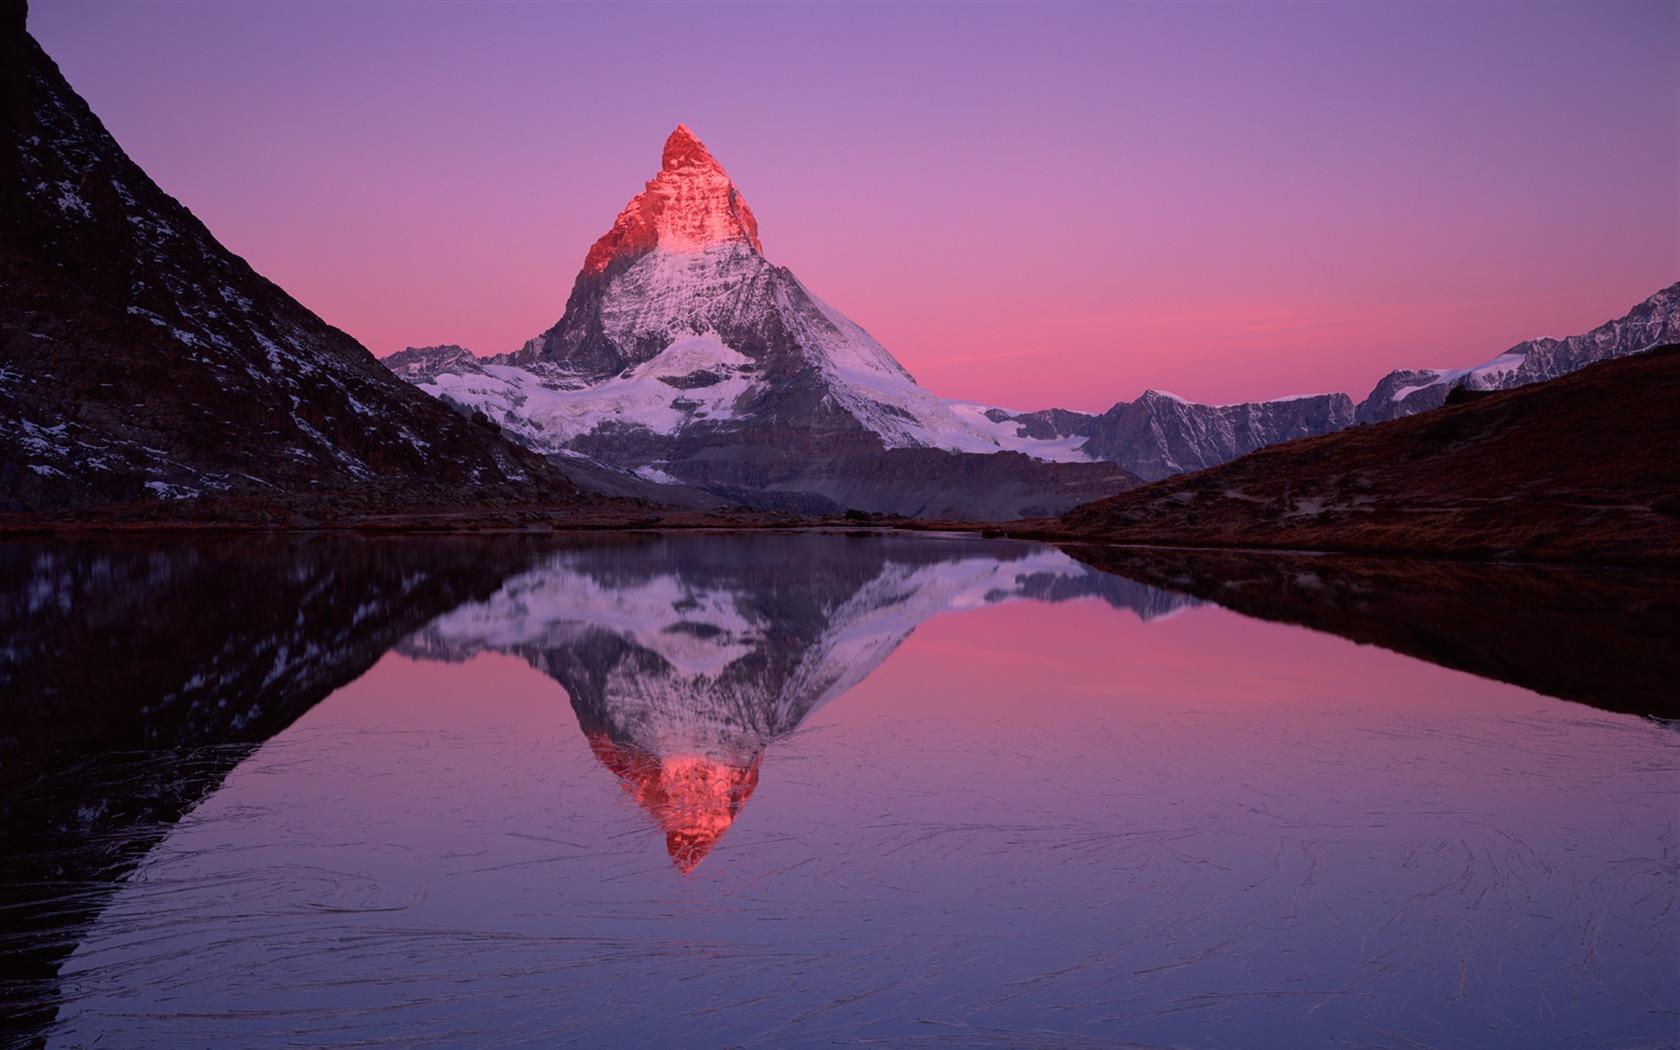 Matterhorn National Geographic 2011 Best Wallpapers Preview